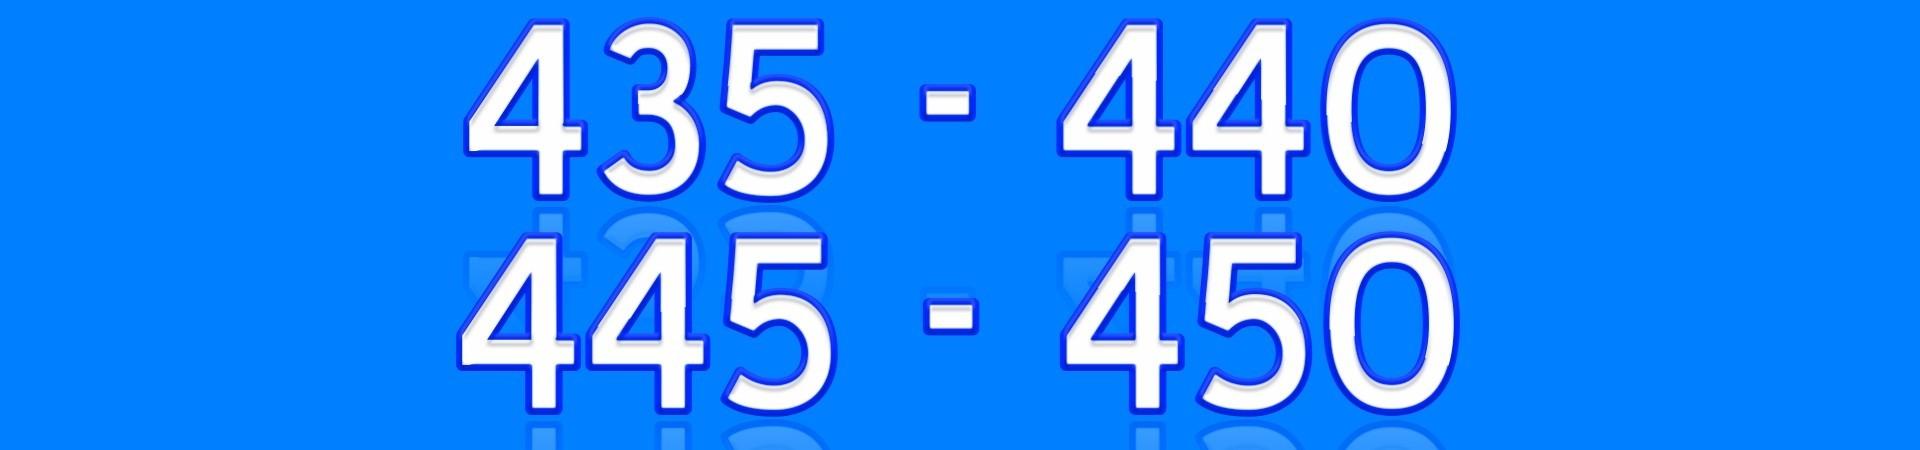 435 440 445 450